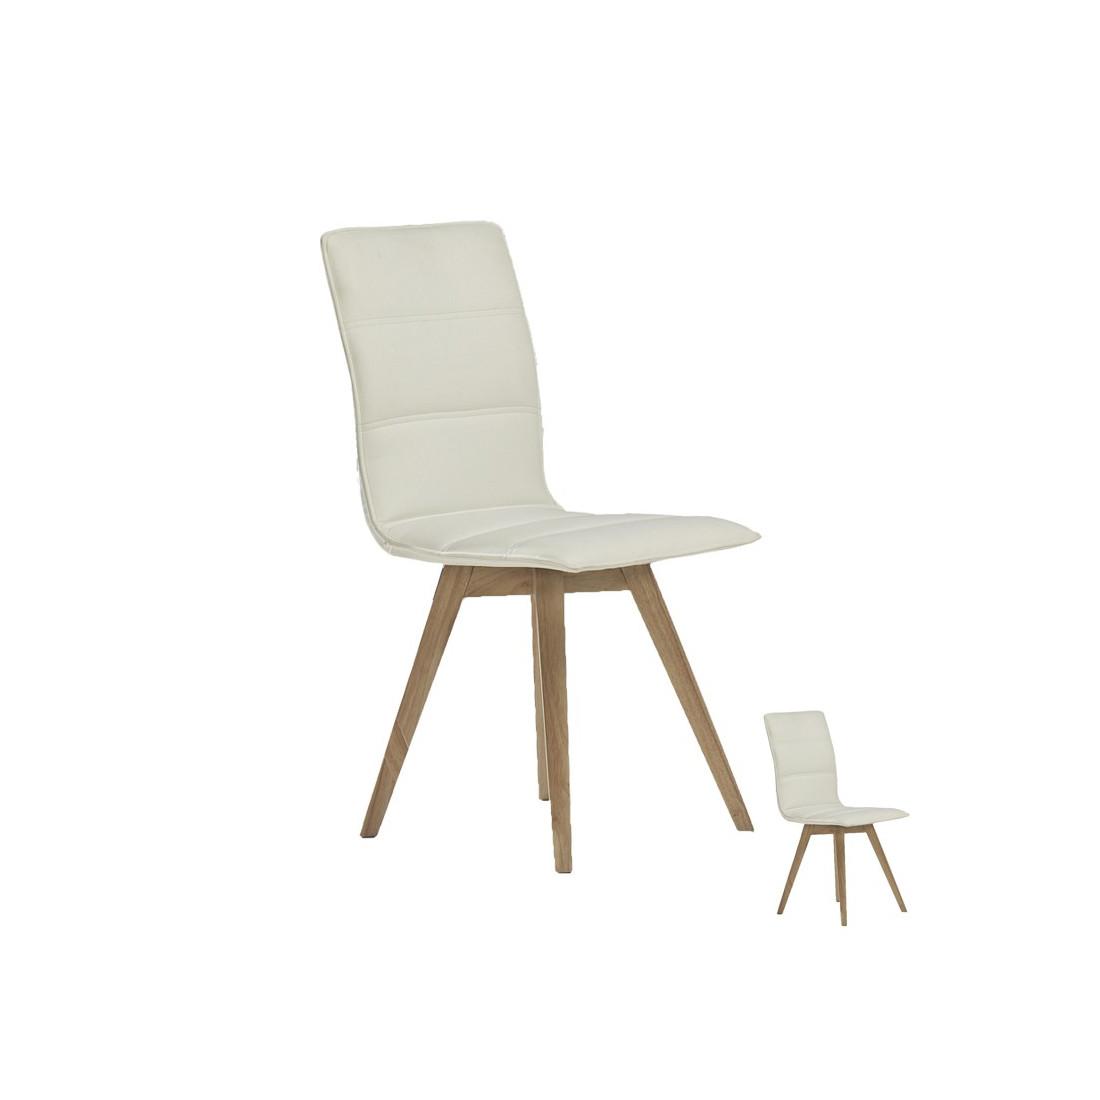 duo de chaises blanches kano univers salle manger tousmesmeubles. Black Bedroom Furniture Sets. Home Design Ideas